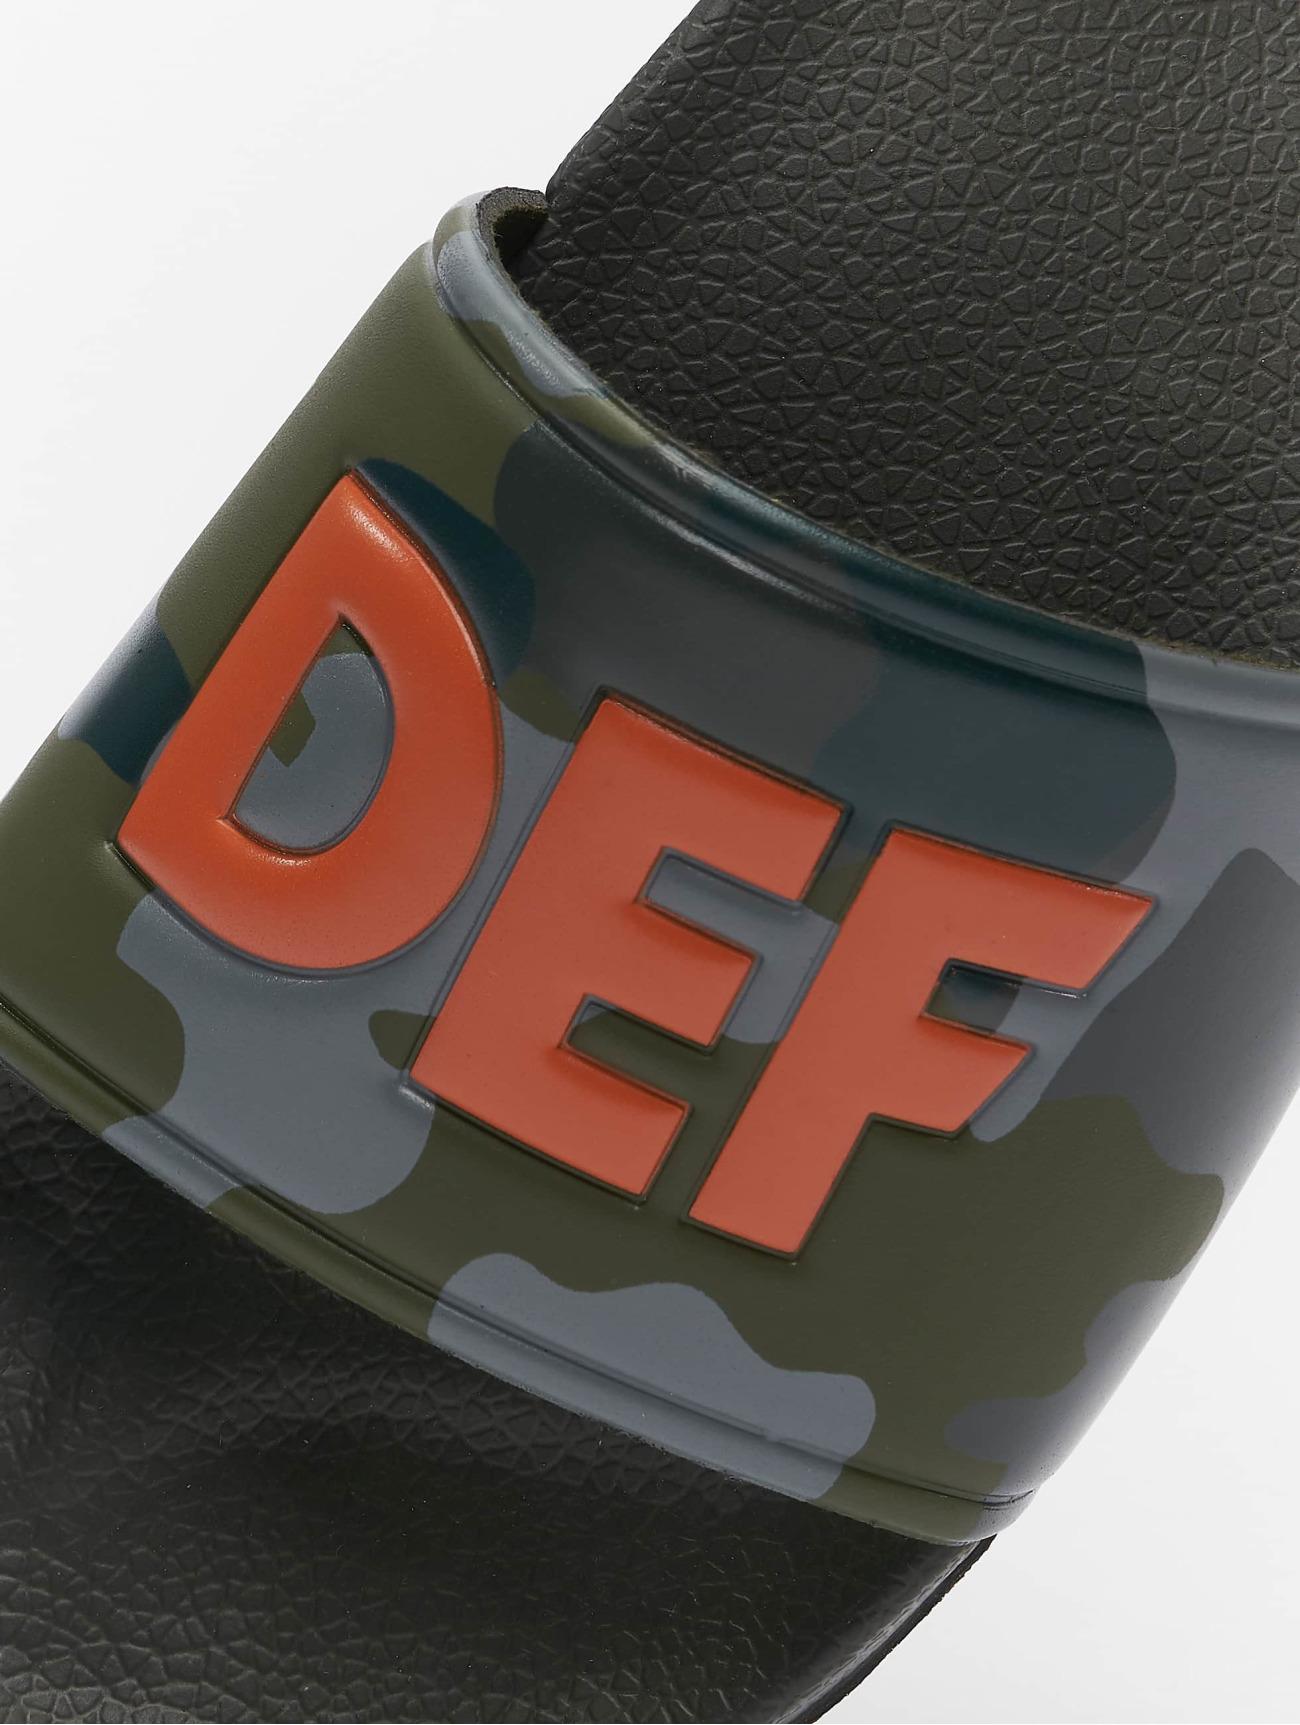 DEF Defiletten camouflage Claquettes & Sandales 580260 Homme Chaussures